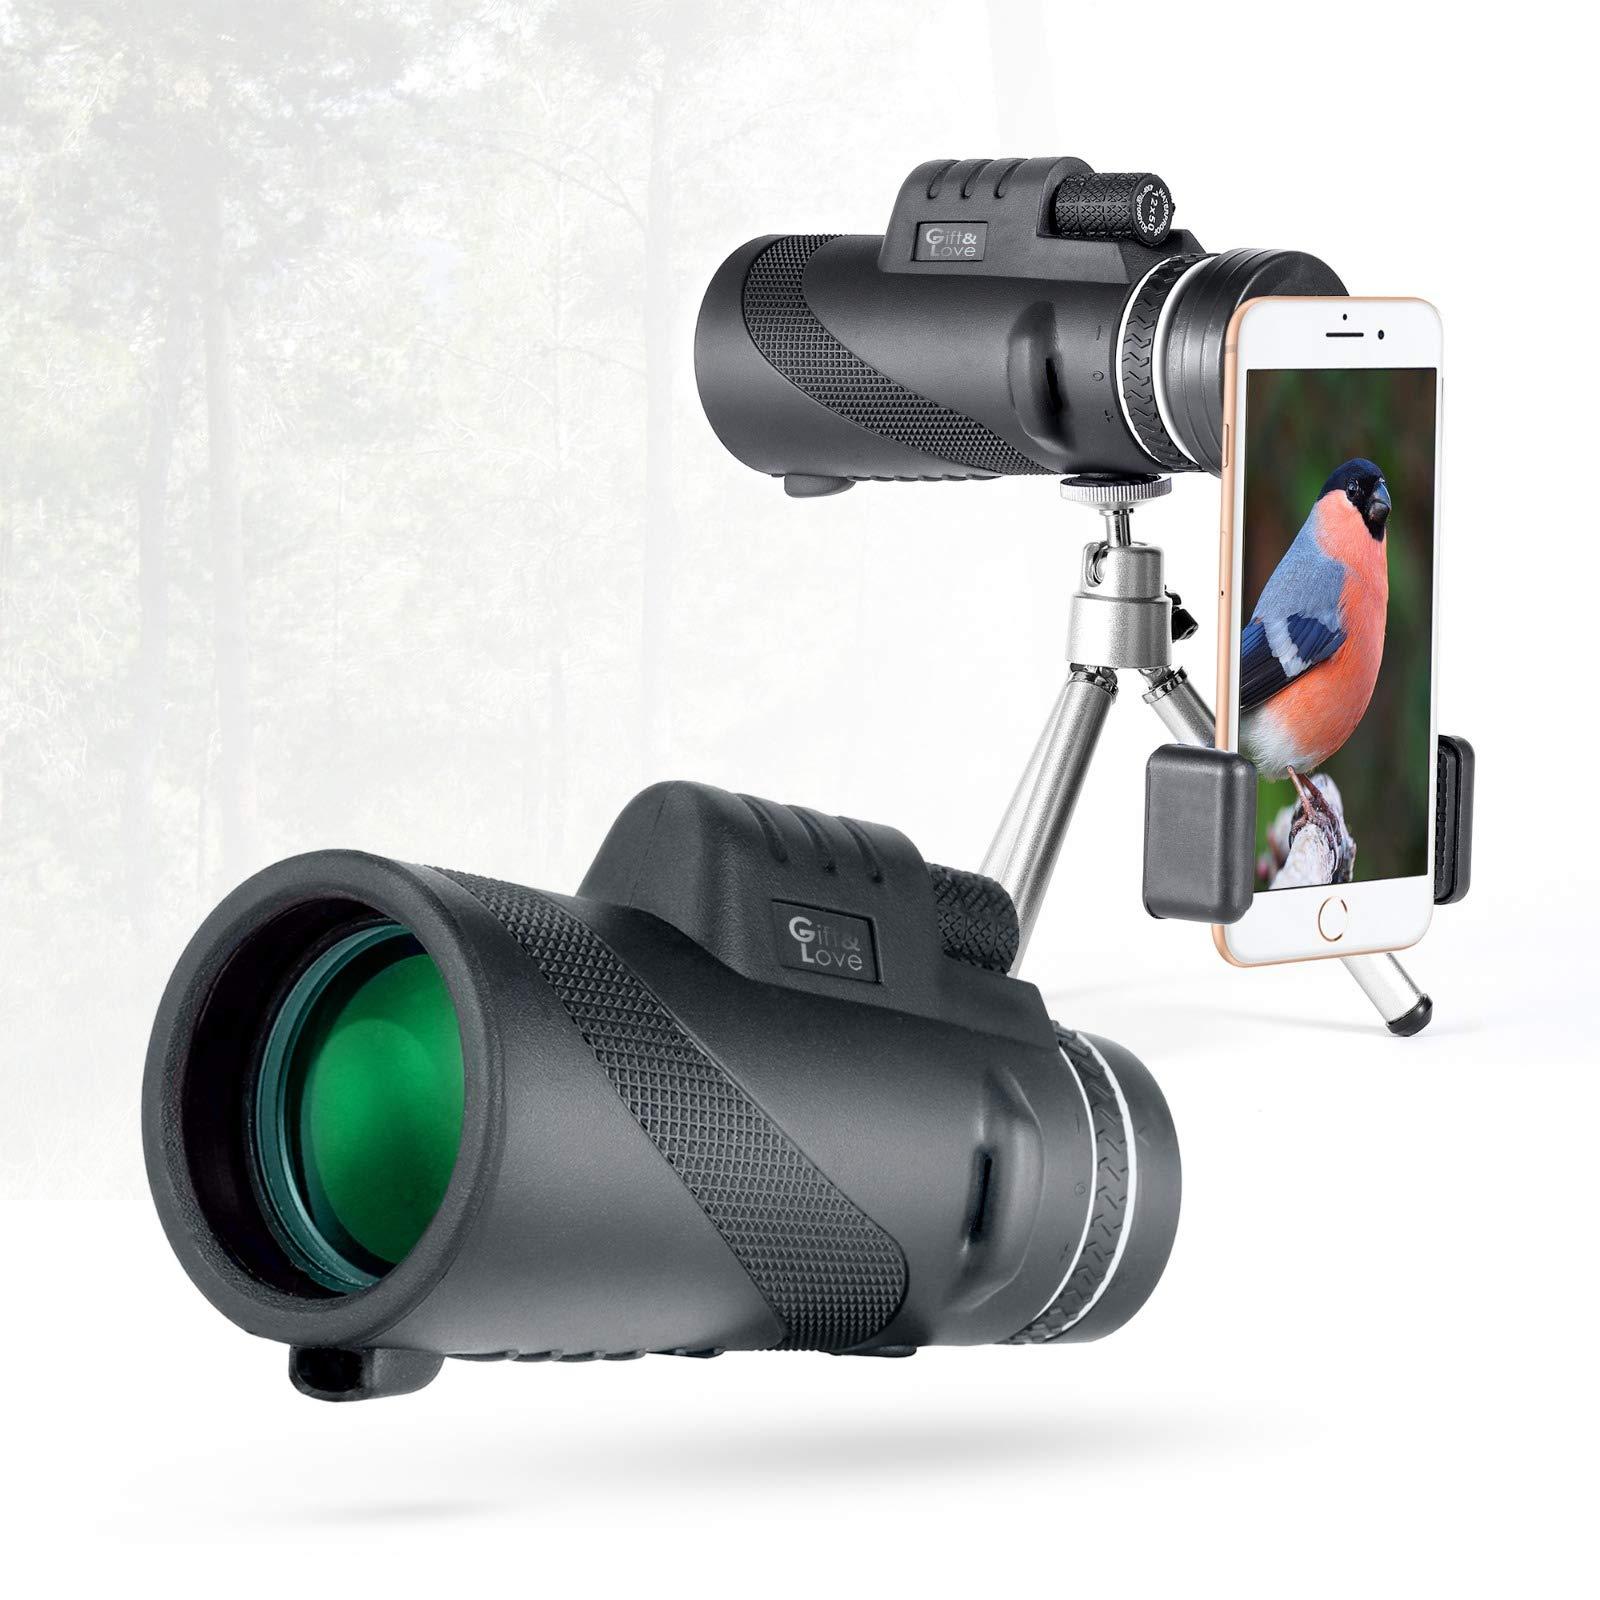 Waterproof BAK4 Prism FMC Coating Mono Scope for Bird Watching Camping Hunting 12x50 HD High Power Telescope with Smart Phone Amount Tripod CGBOOM Monocular Telescope Hiking